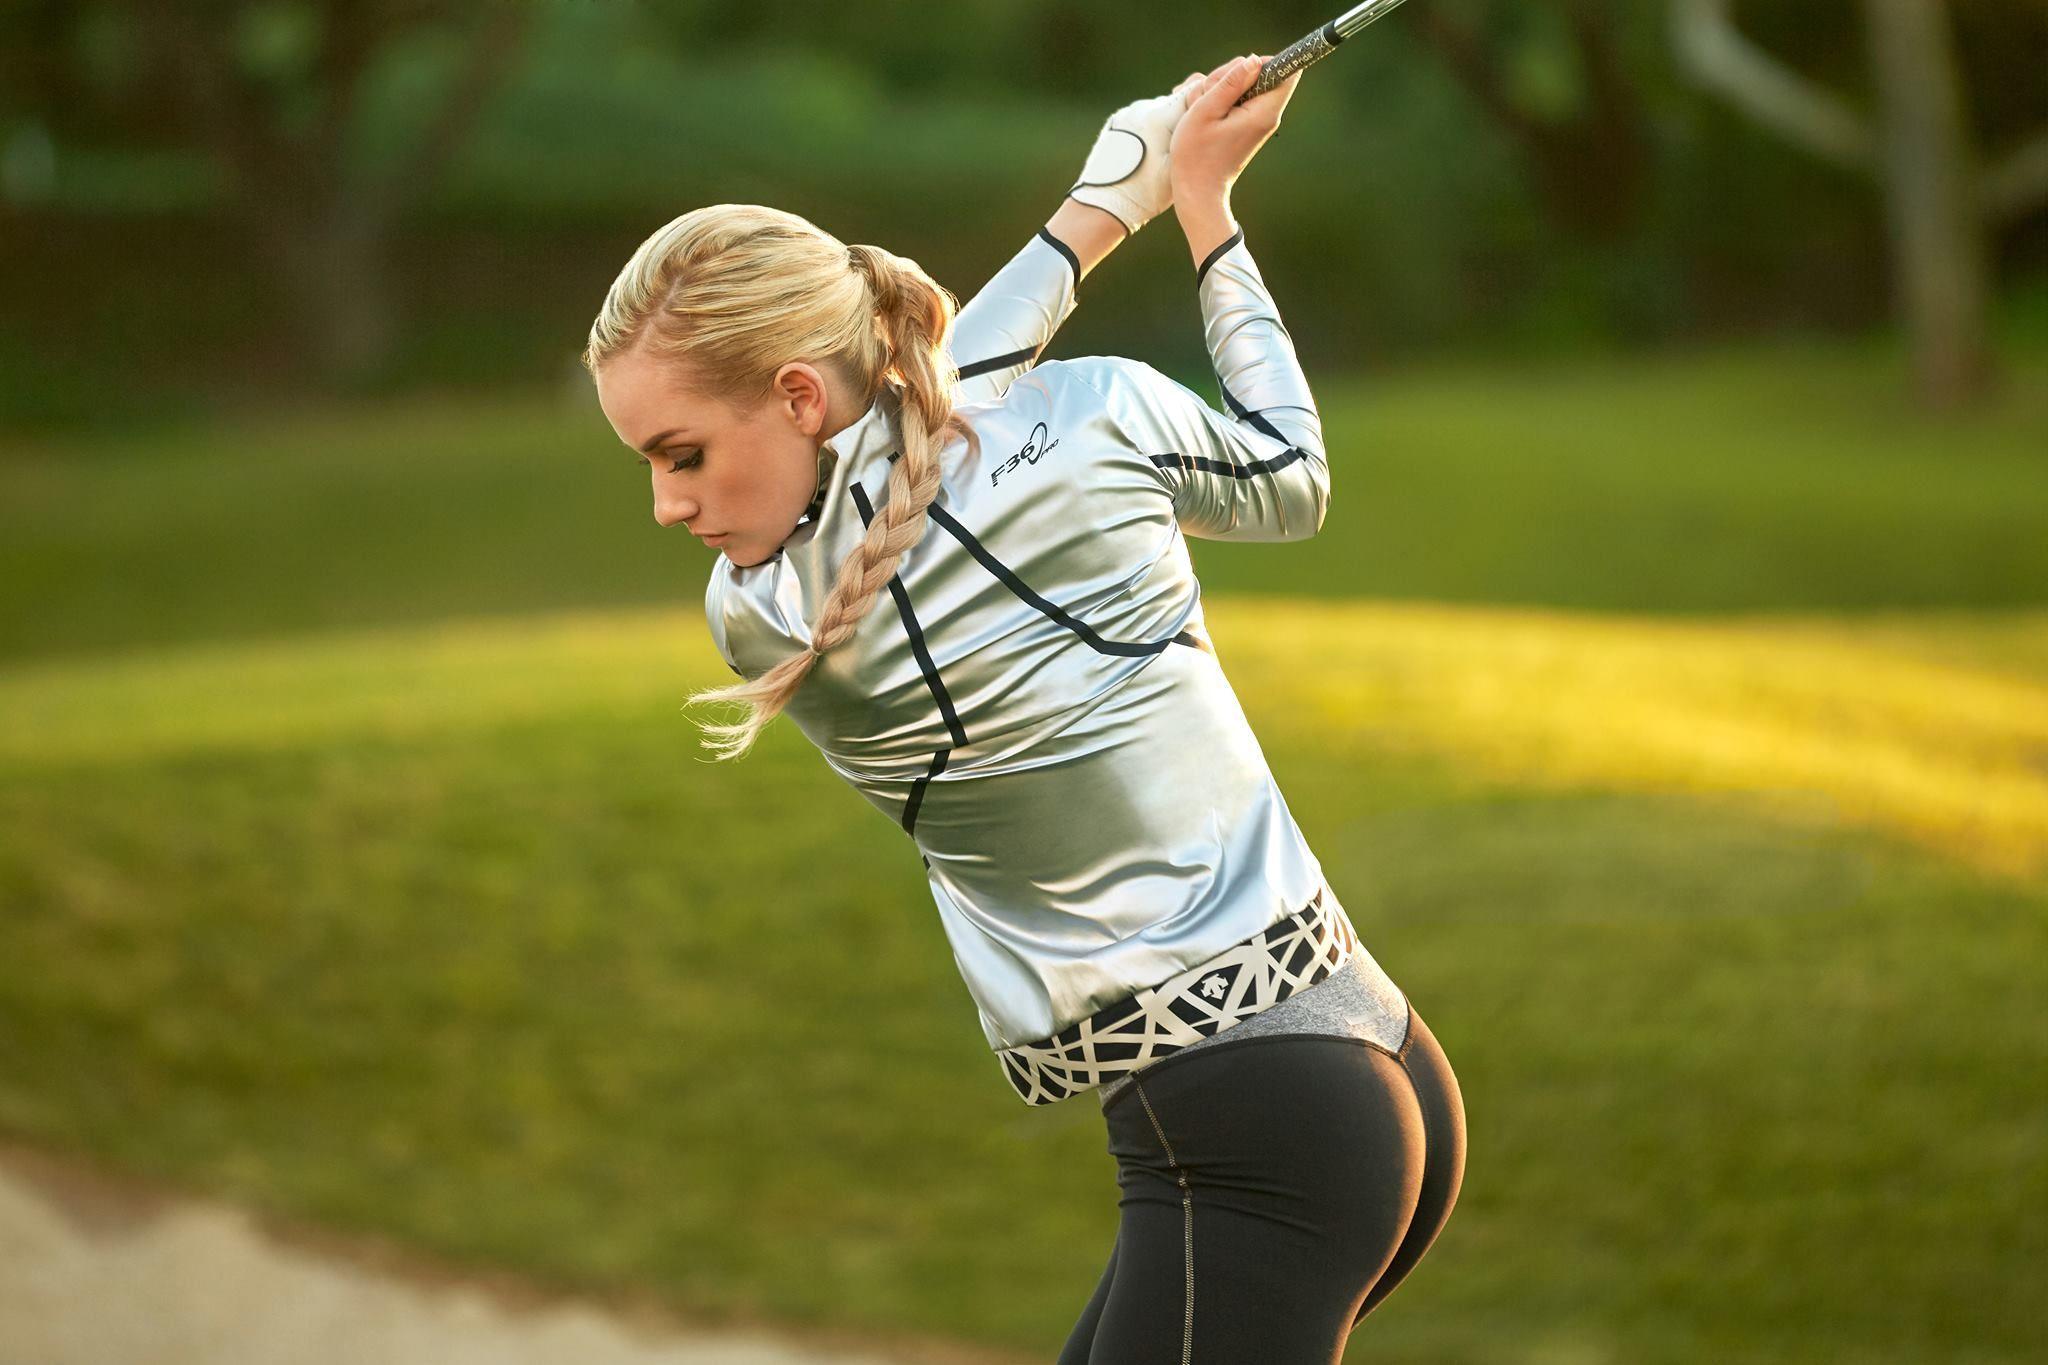 Golfista Paige Spiranac - Crédito: _paige.renee